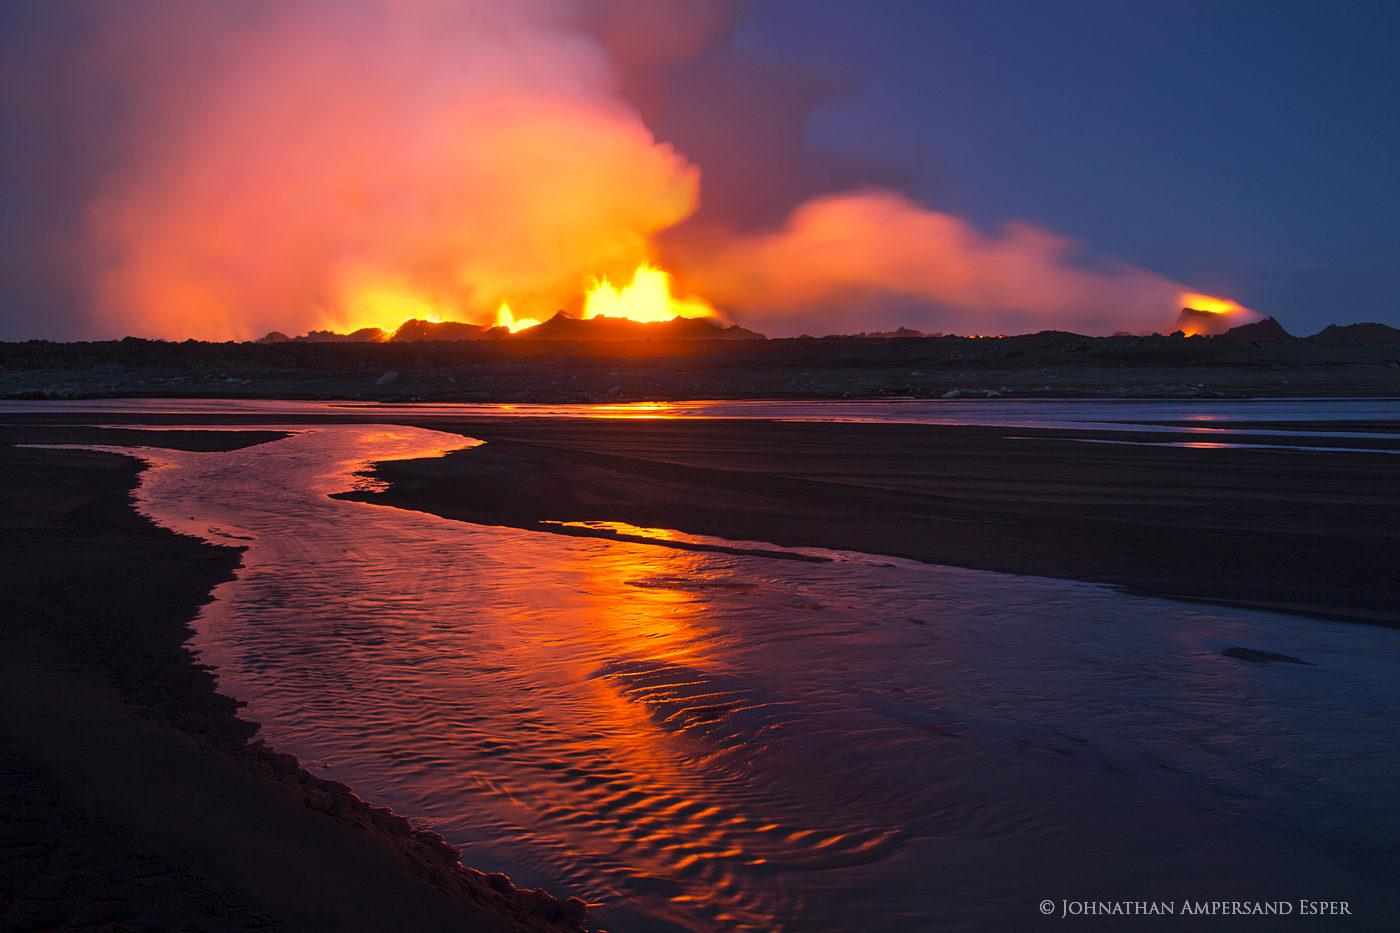 Holuhraun eruption red glow reflection in an intermittent stream, after sunset